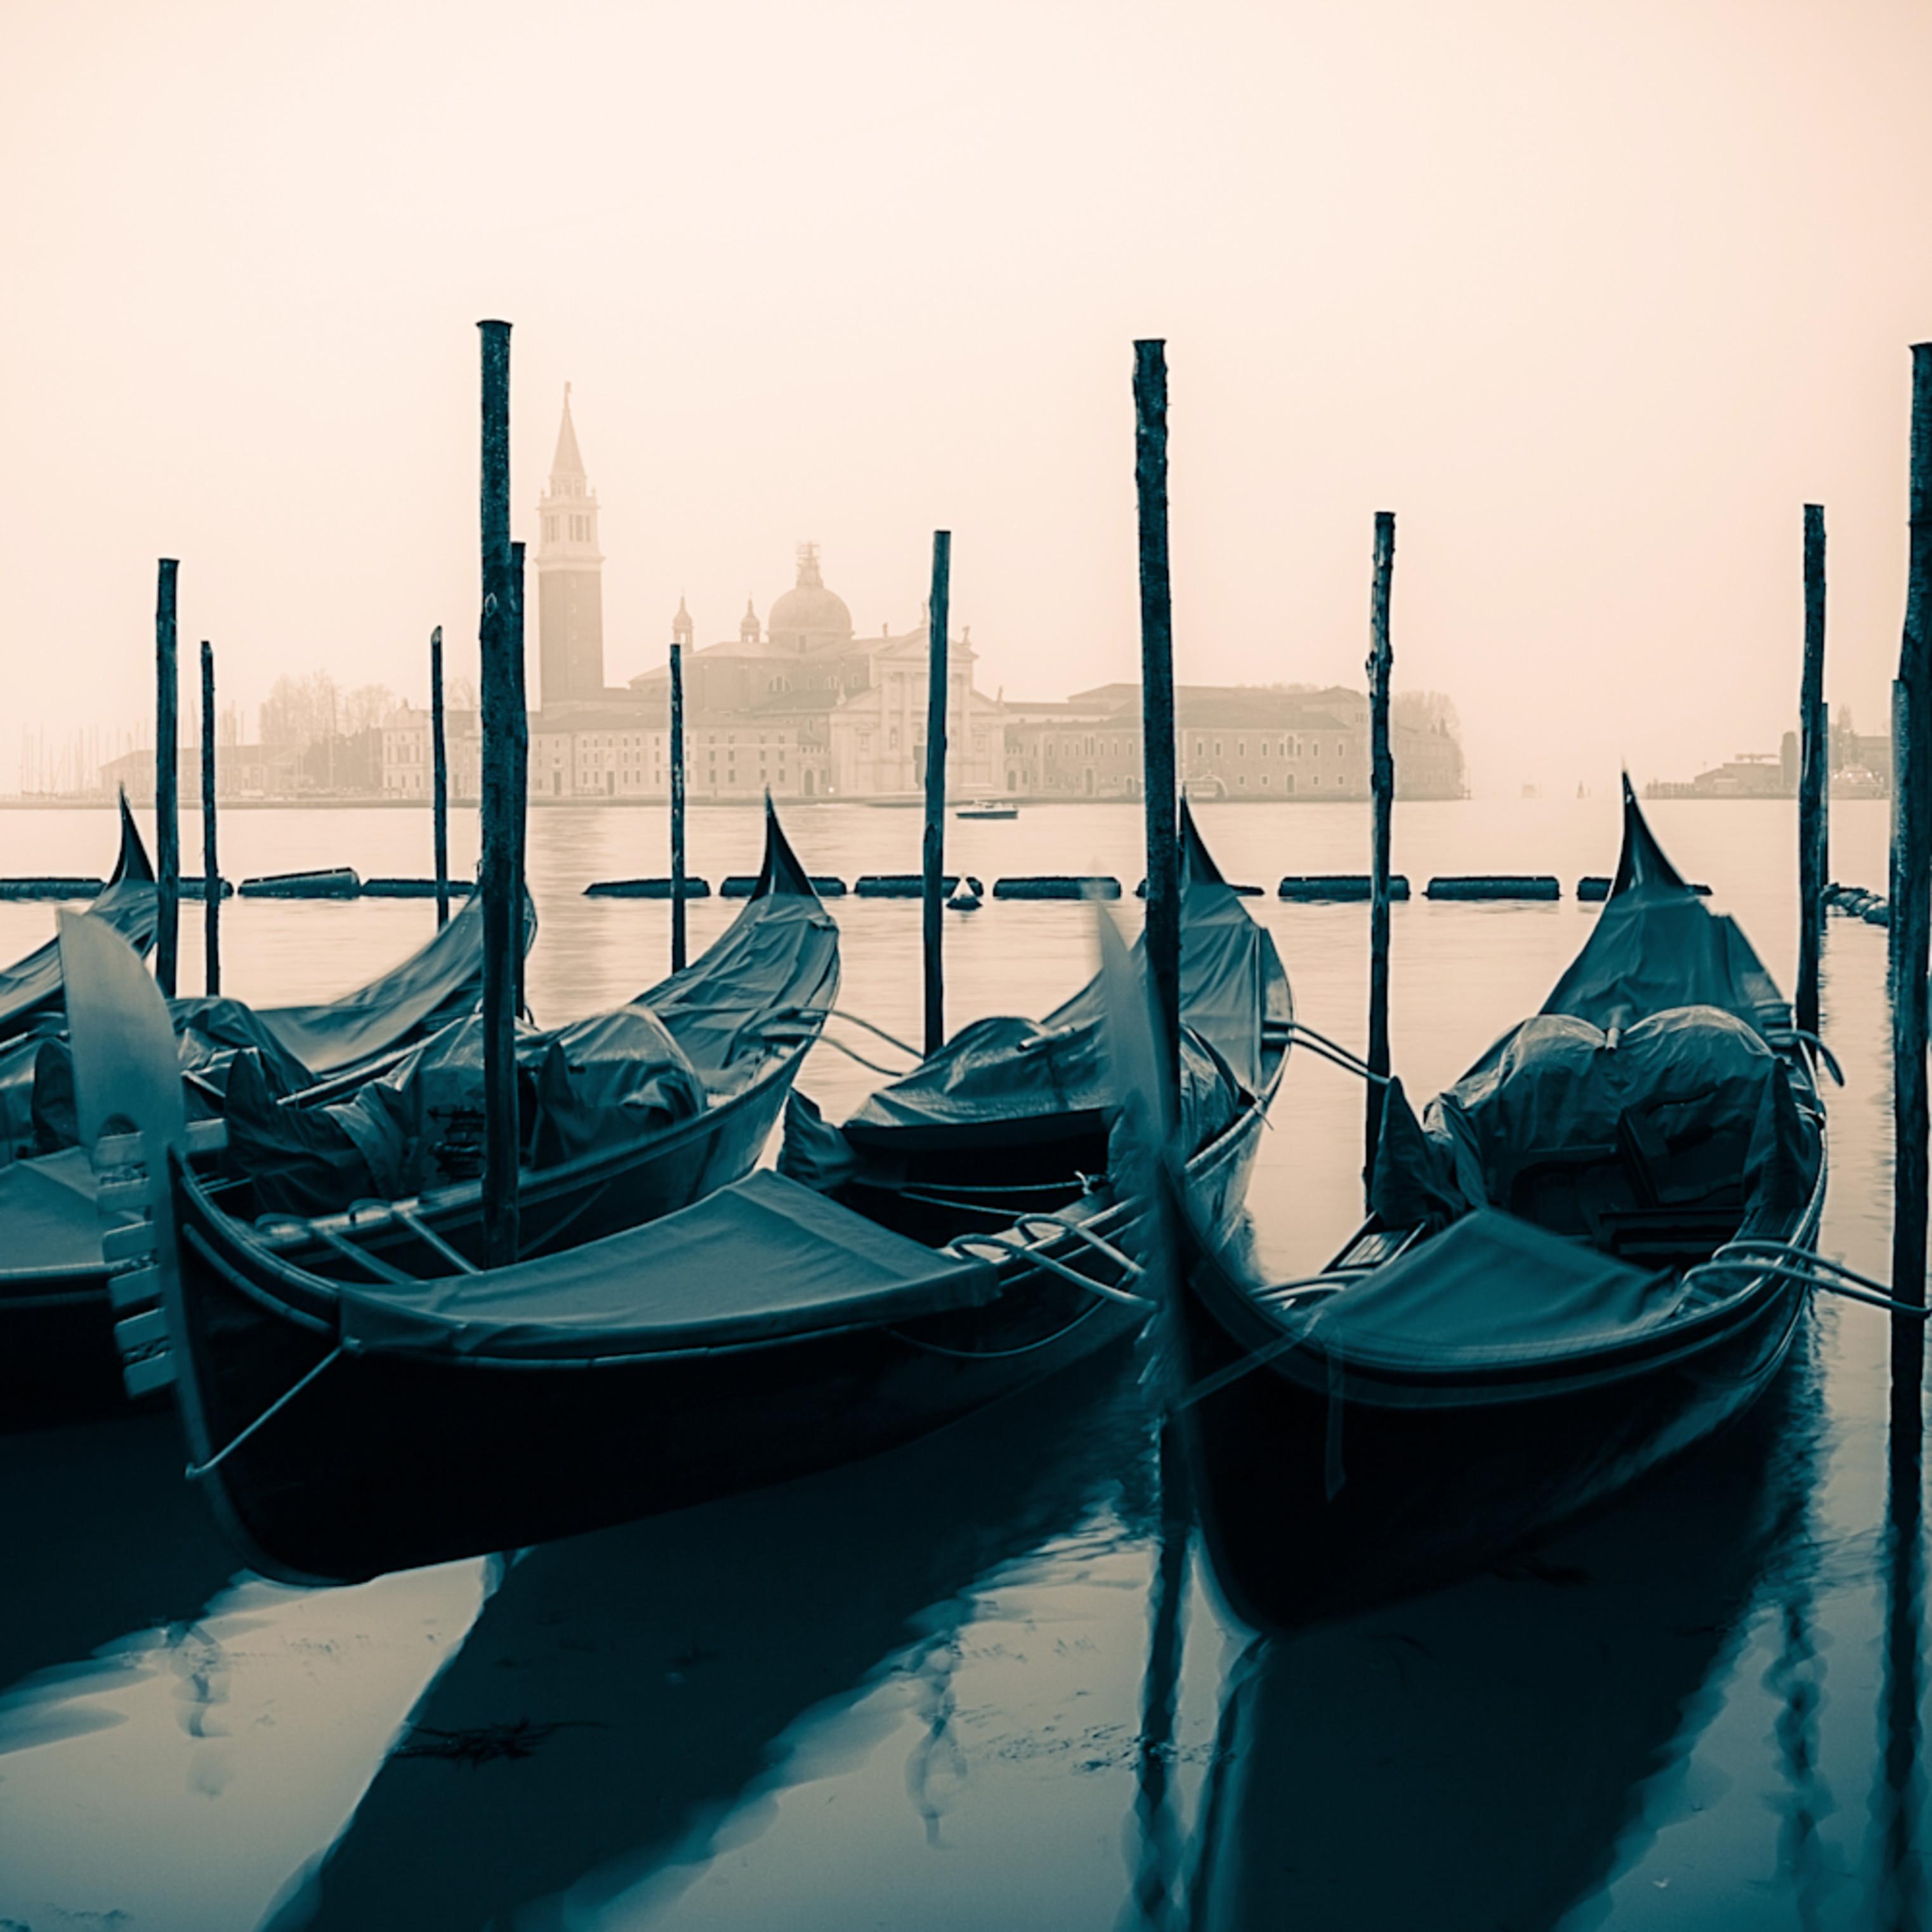 Venezia pizh8l